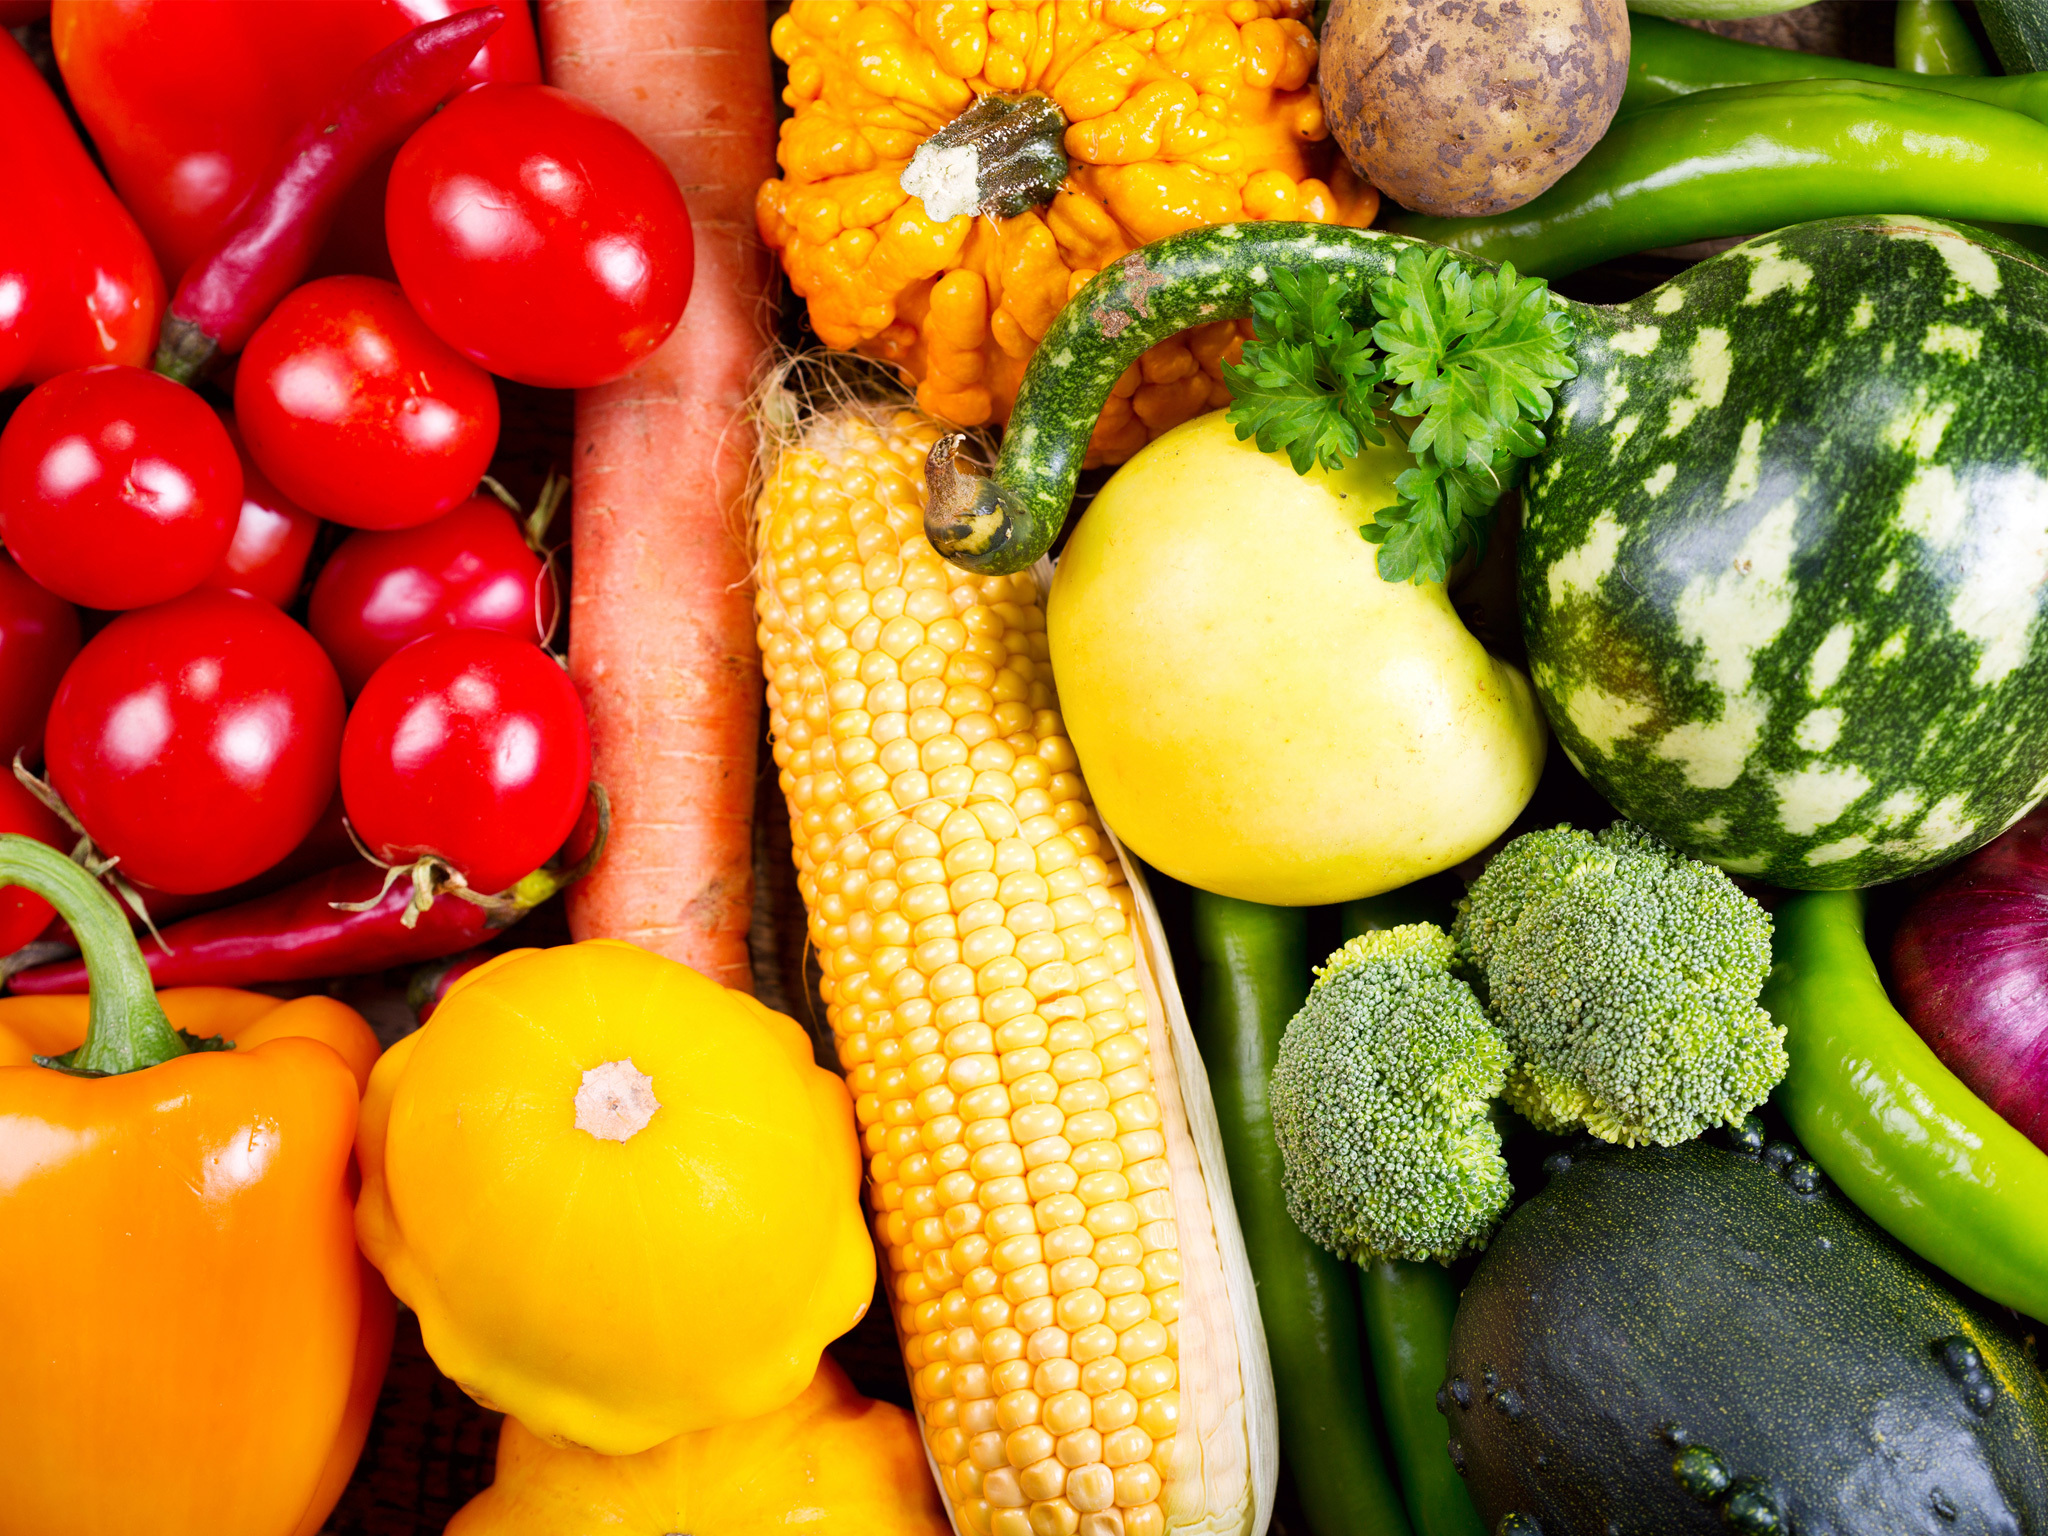 Comida saludable a domicilio